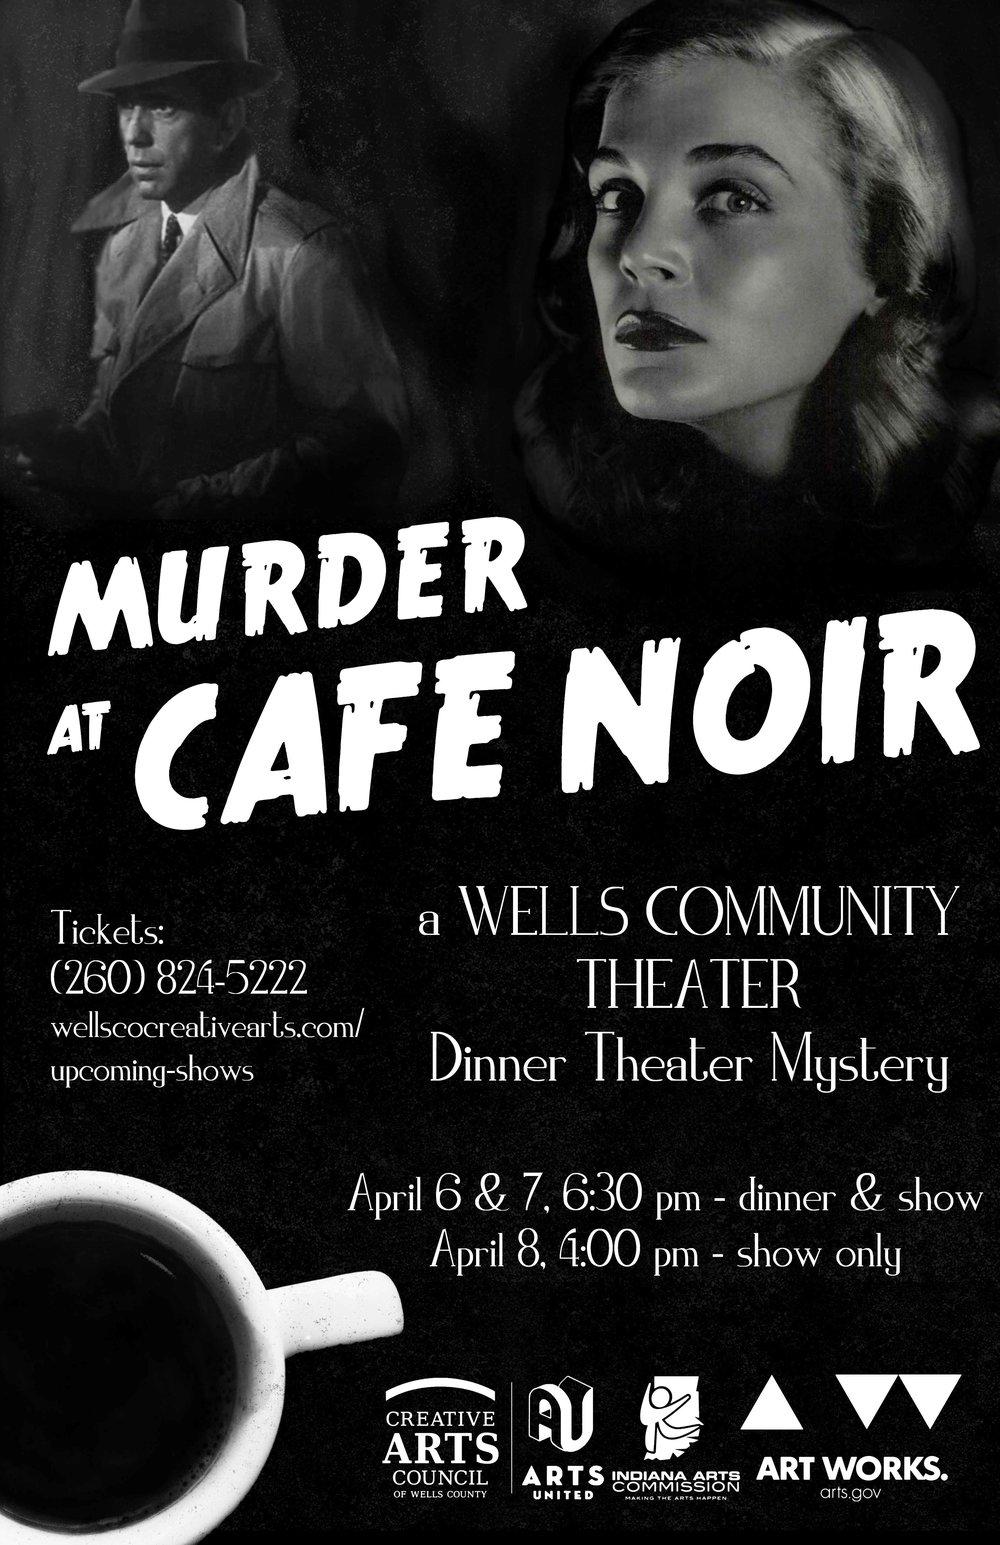 Murder at Cafe Noir Poster-Small.jpg